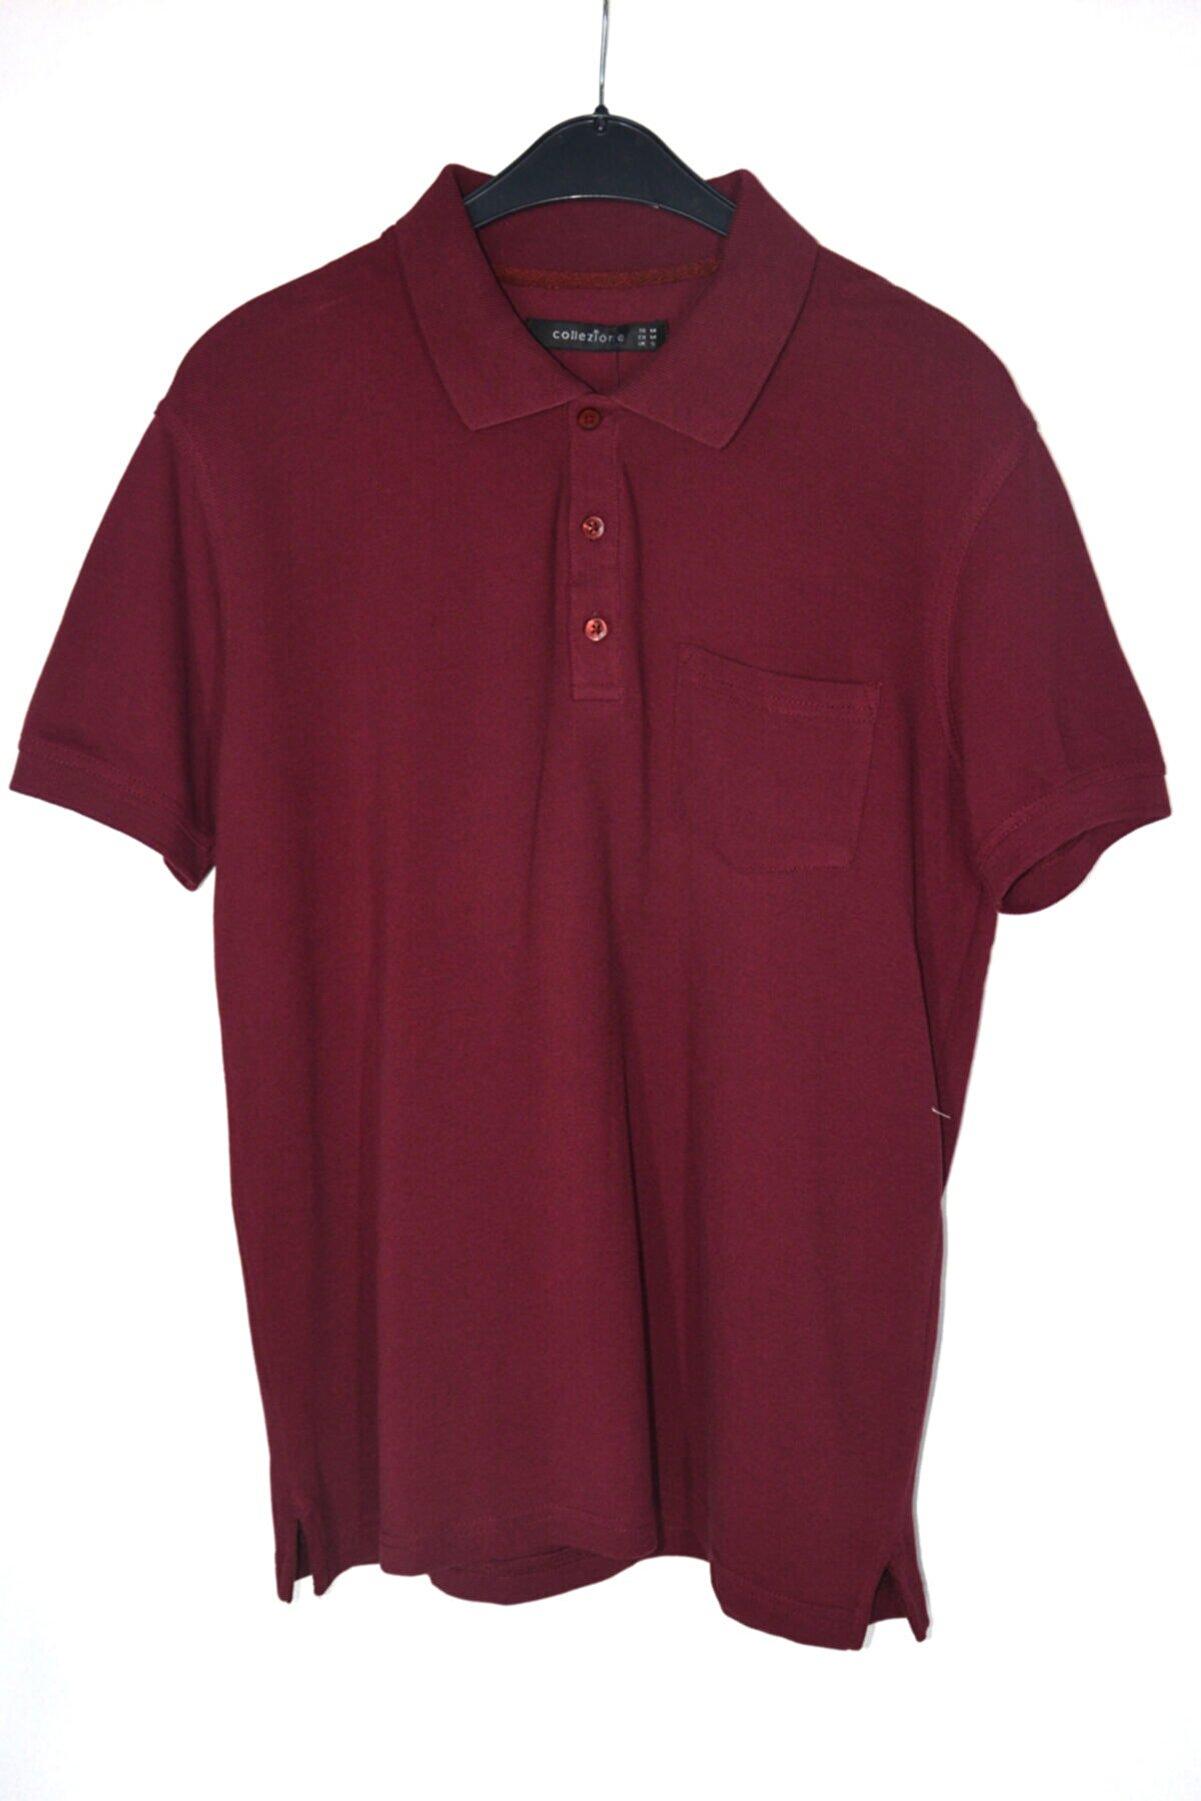 Collezione Erkek Bordo Klasik Polo Yaka Lacoste T-shirt